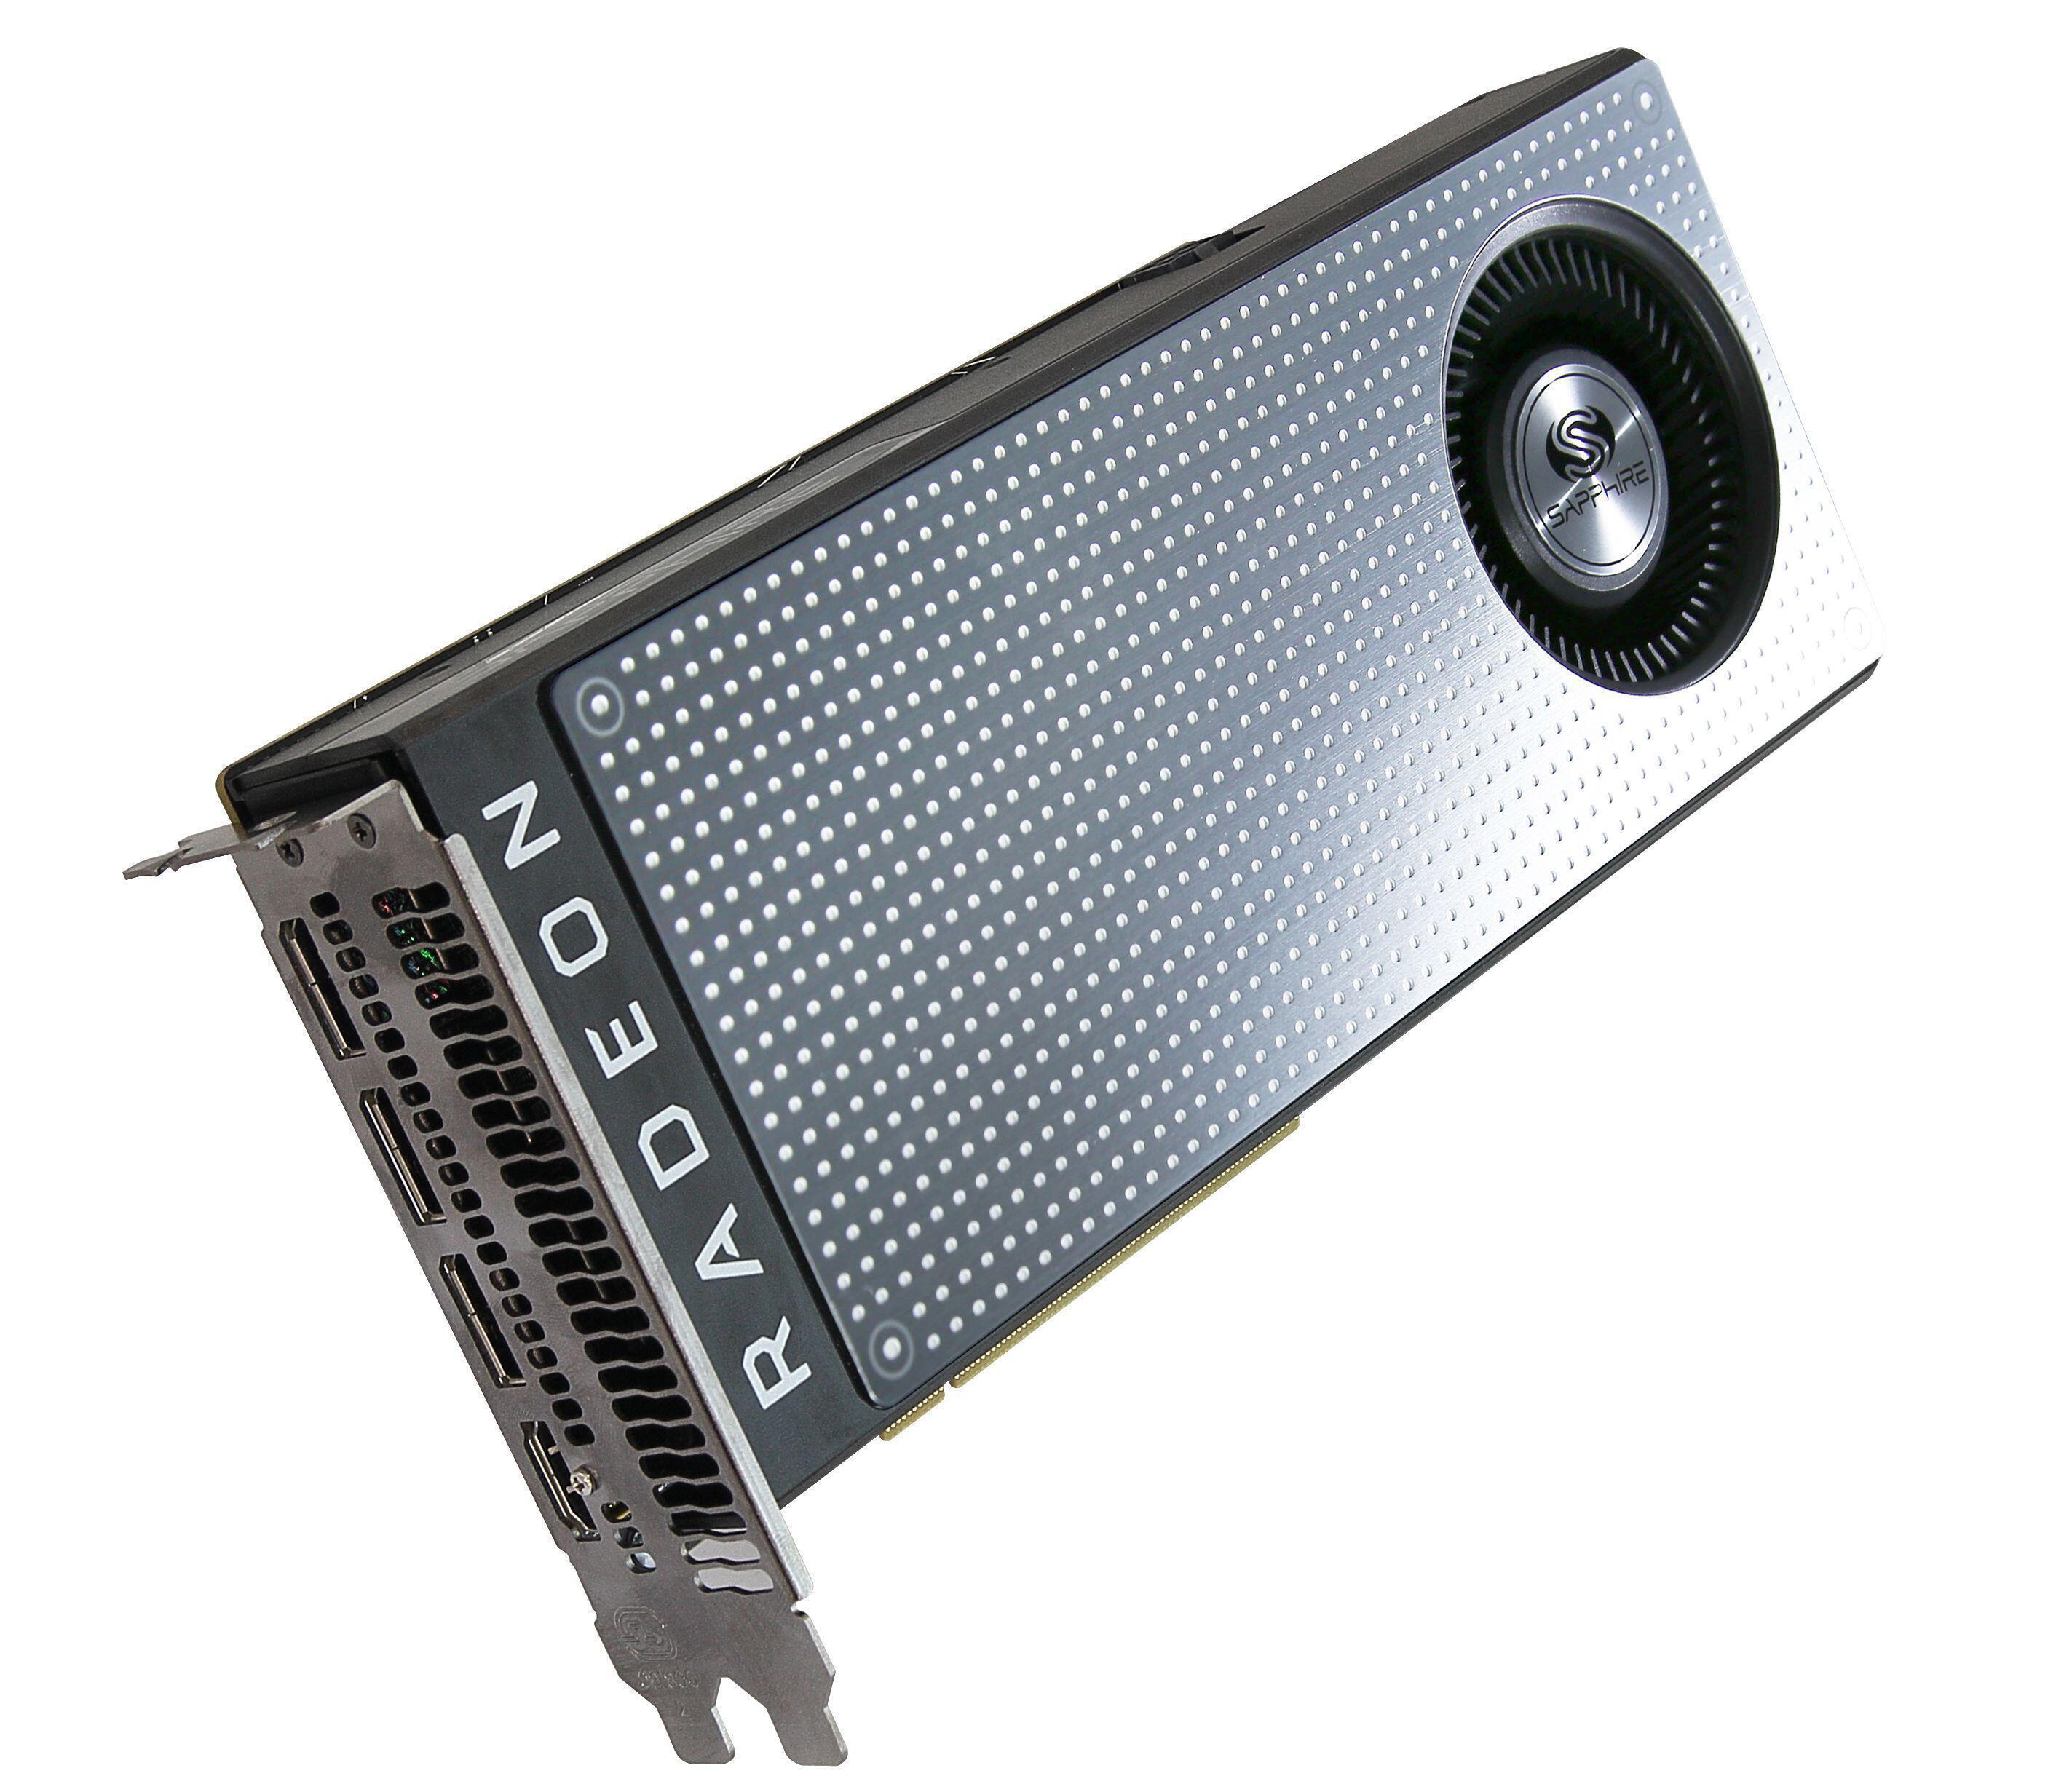 AMD Radeon RX 470 以太坊矿机 24 MH/s